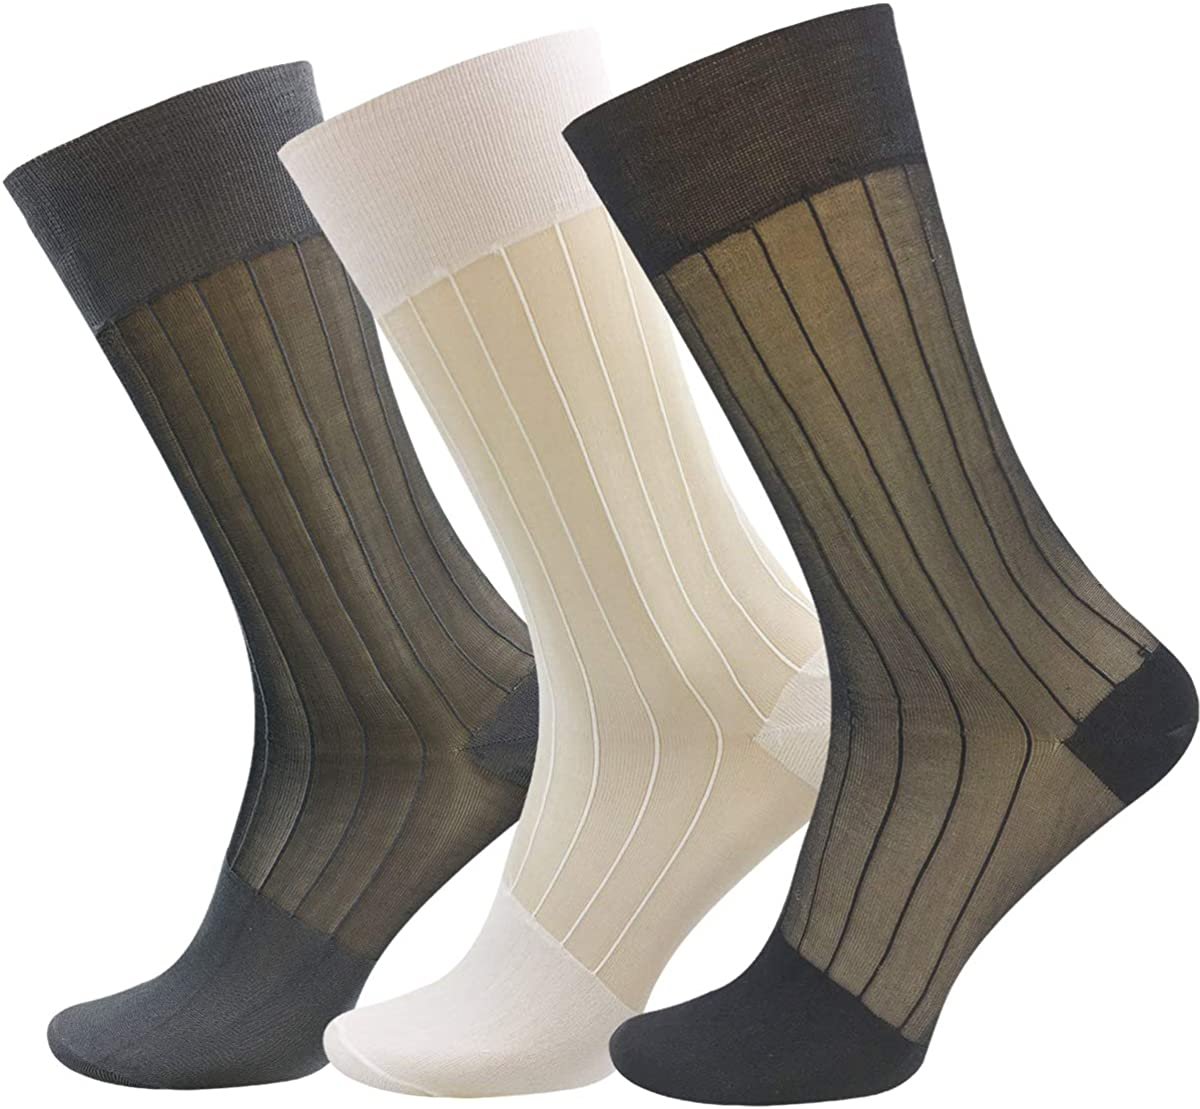 3 Pairs Mens Silk Sheer Socks Mid Calf OTC Ultra Thin Nylon Dress Sock Soft Daily Casual Stockings Work Business Sox